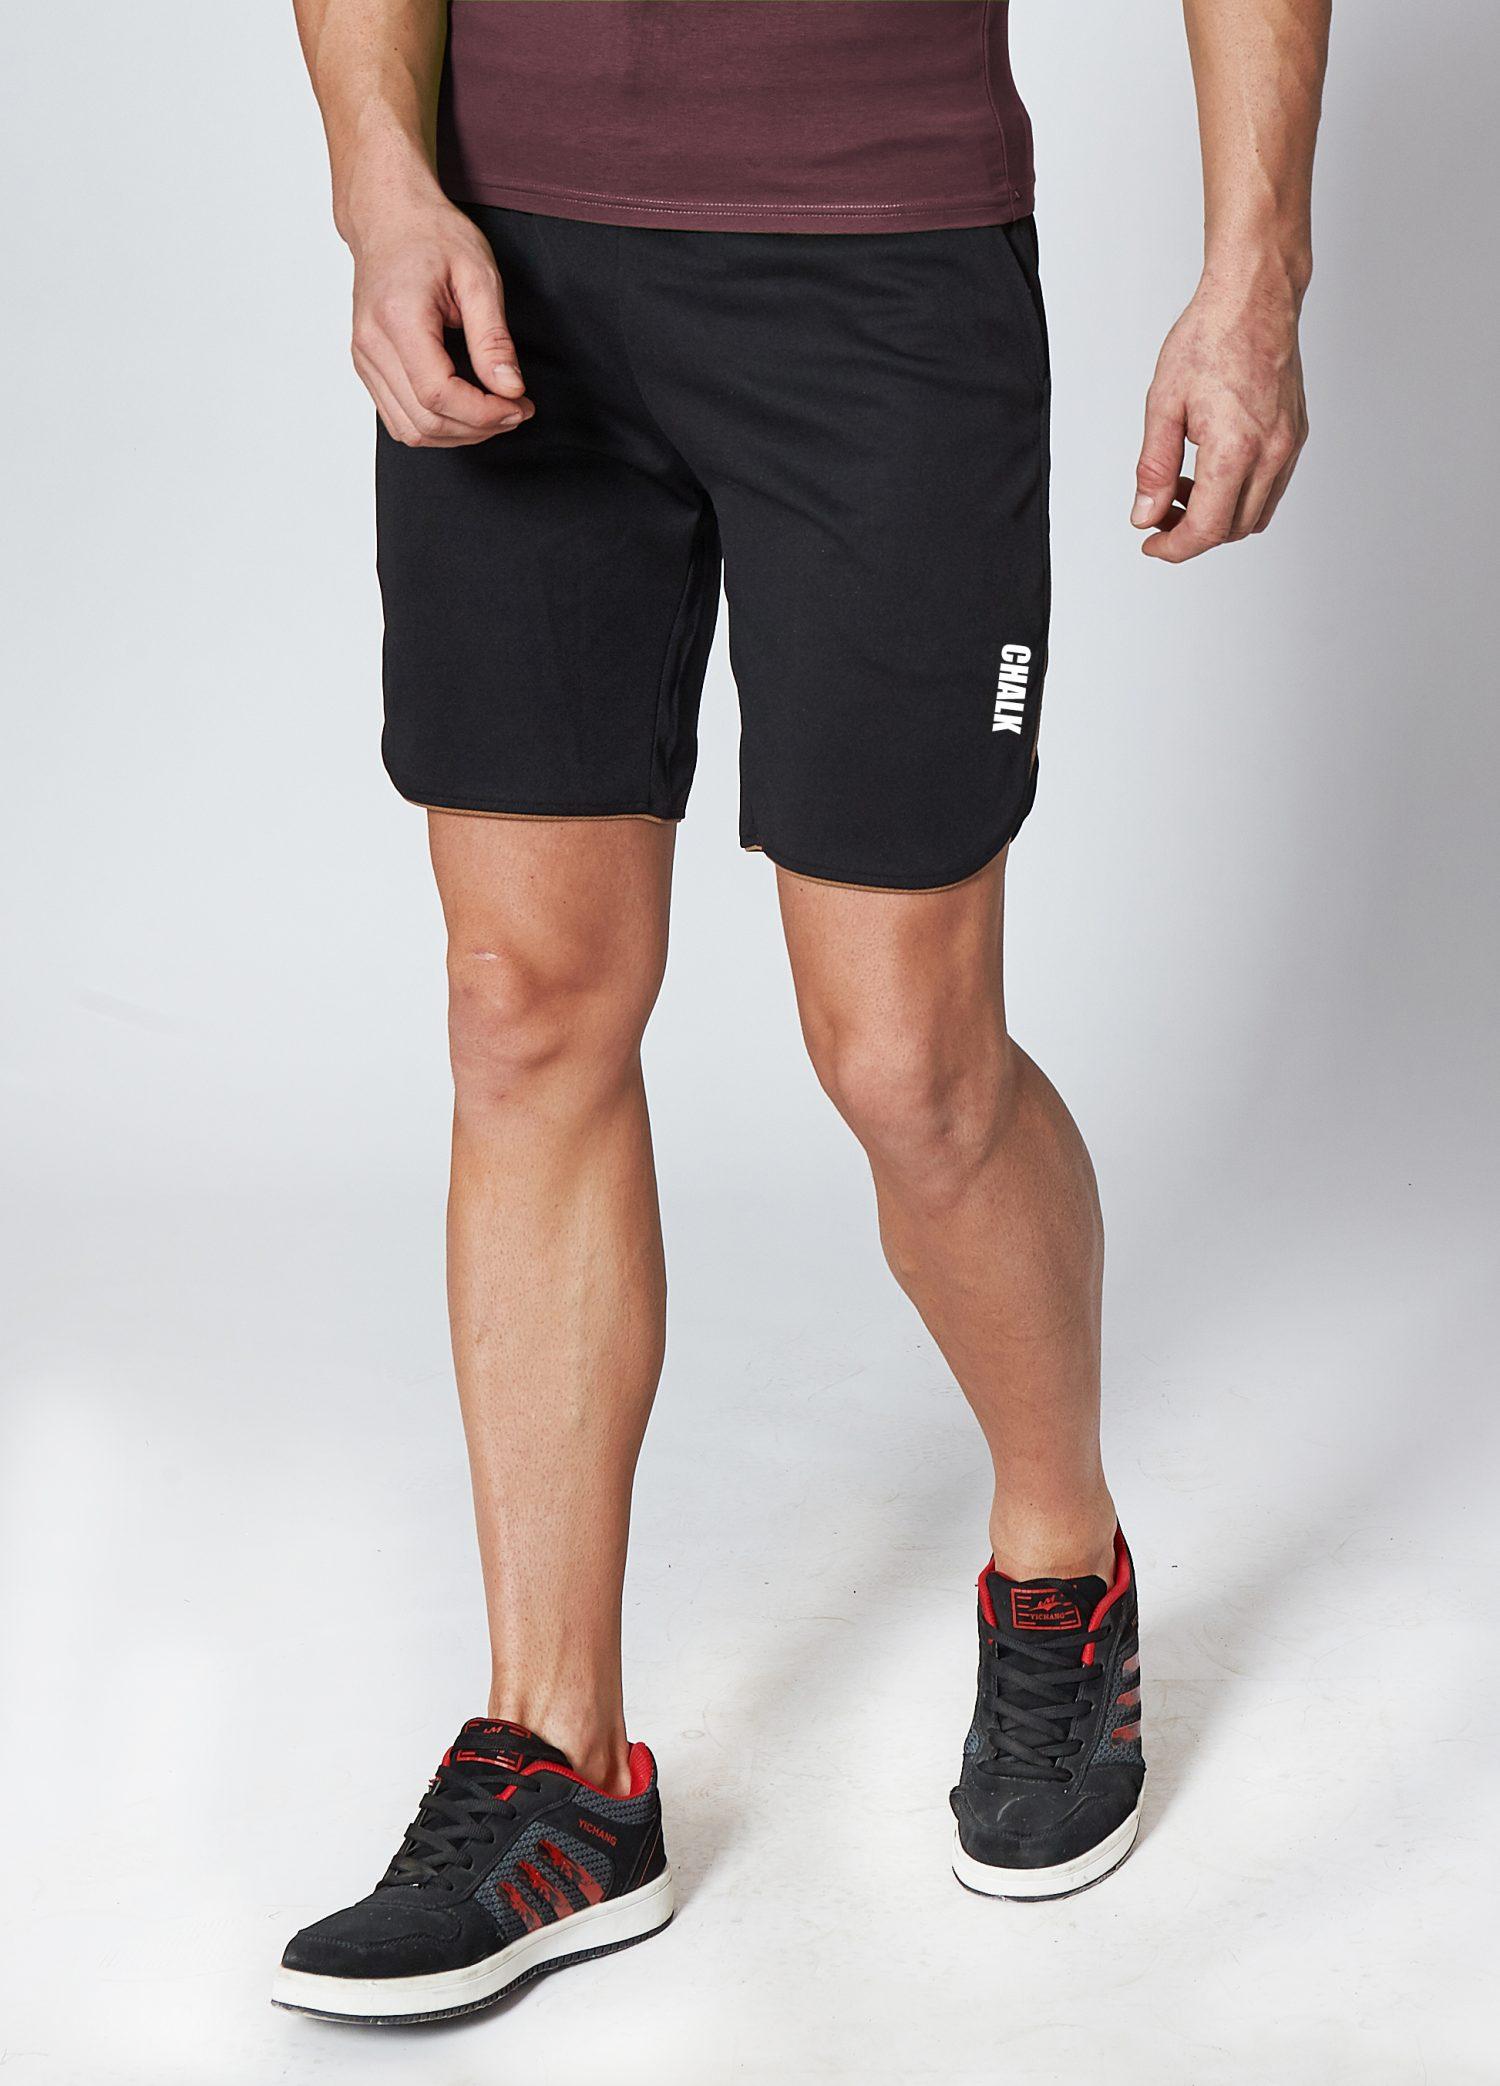 Black WOD shorts